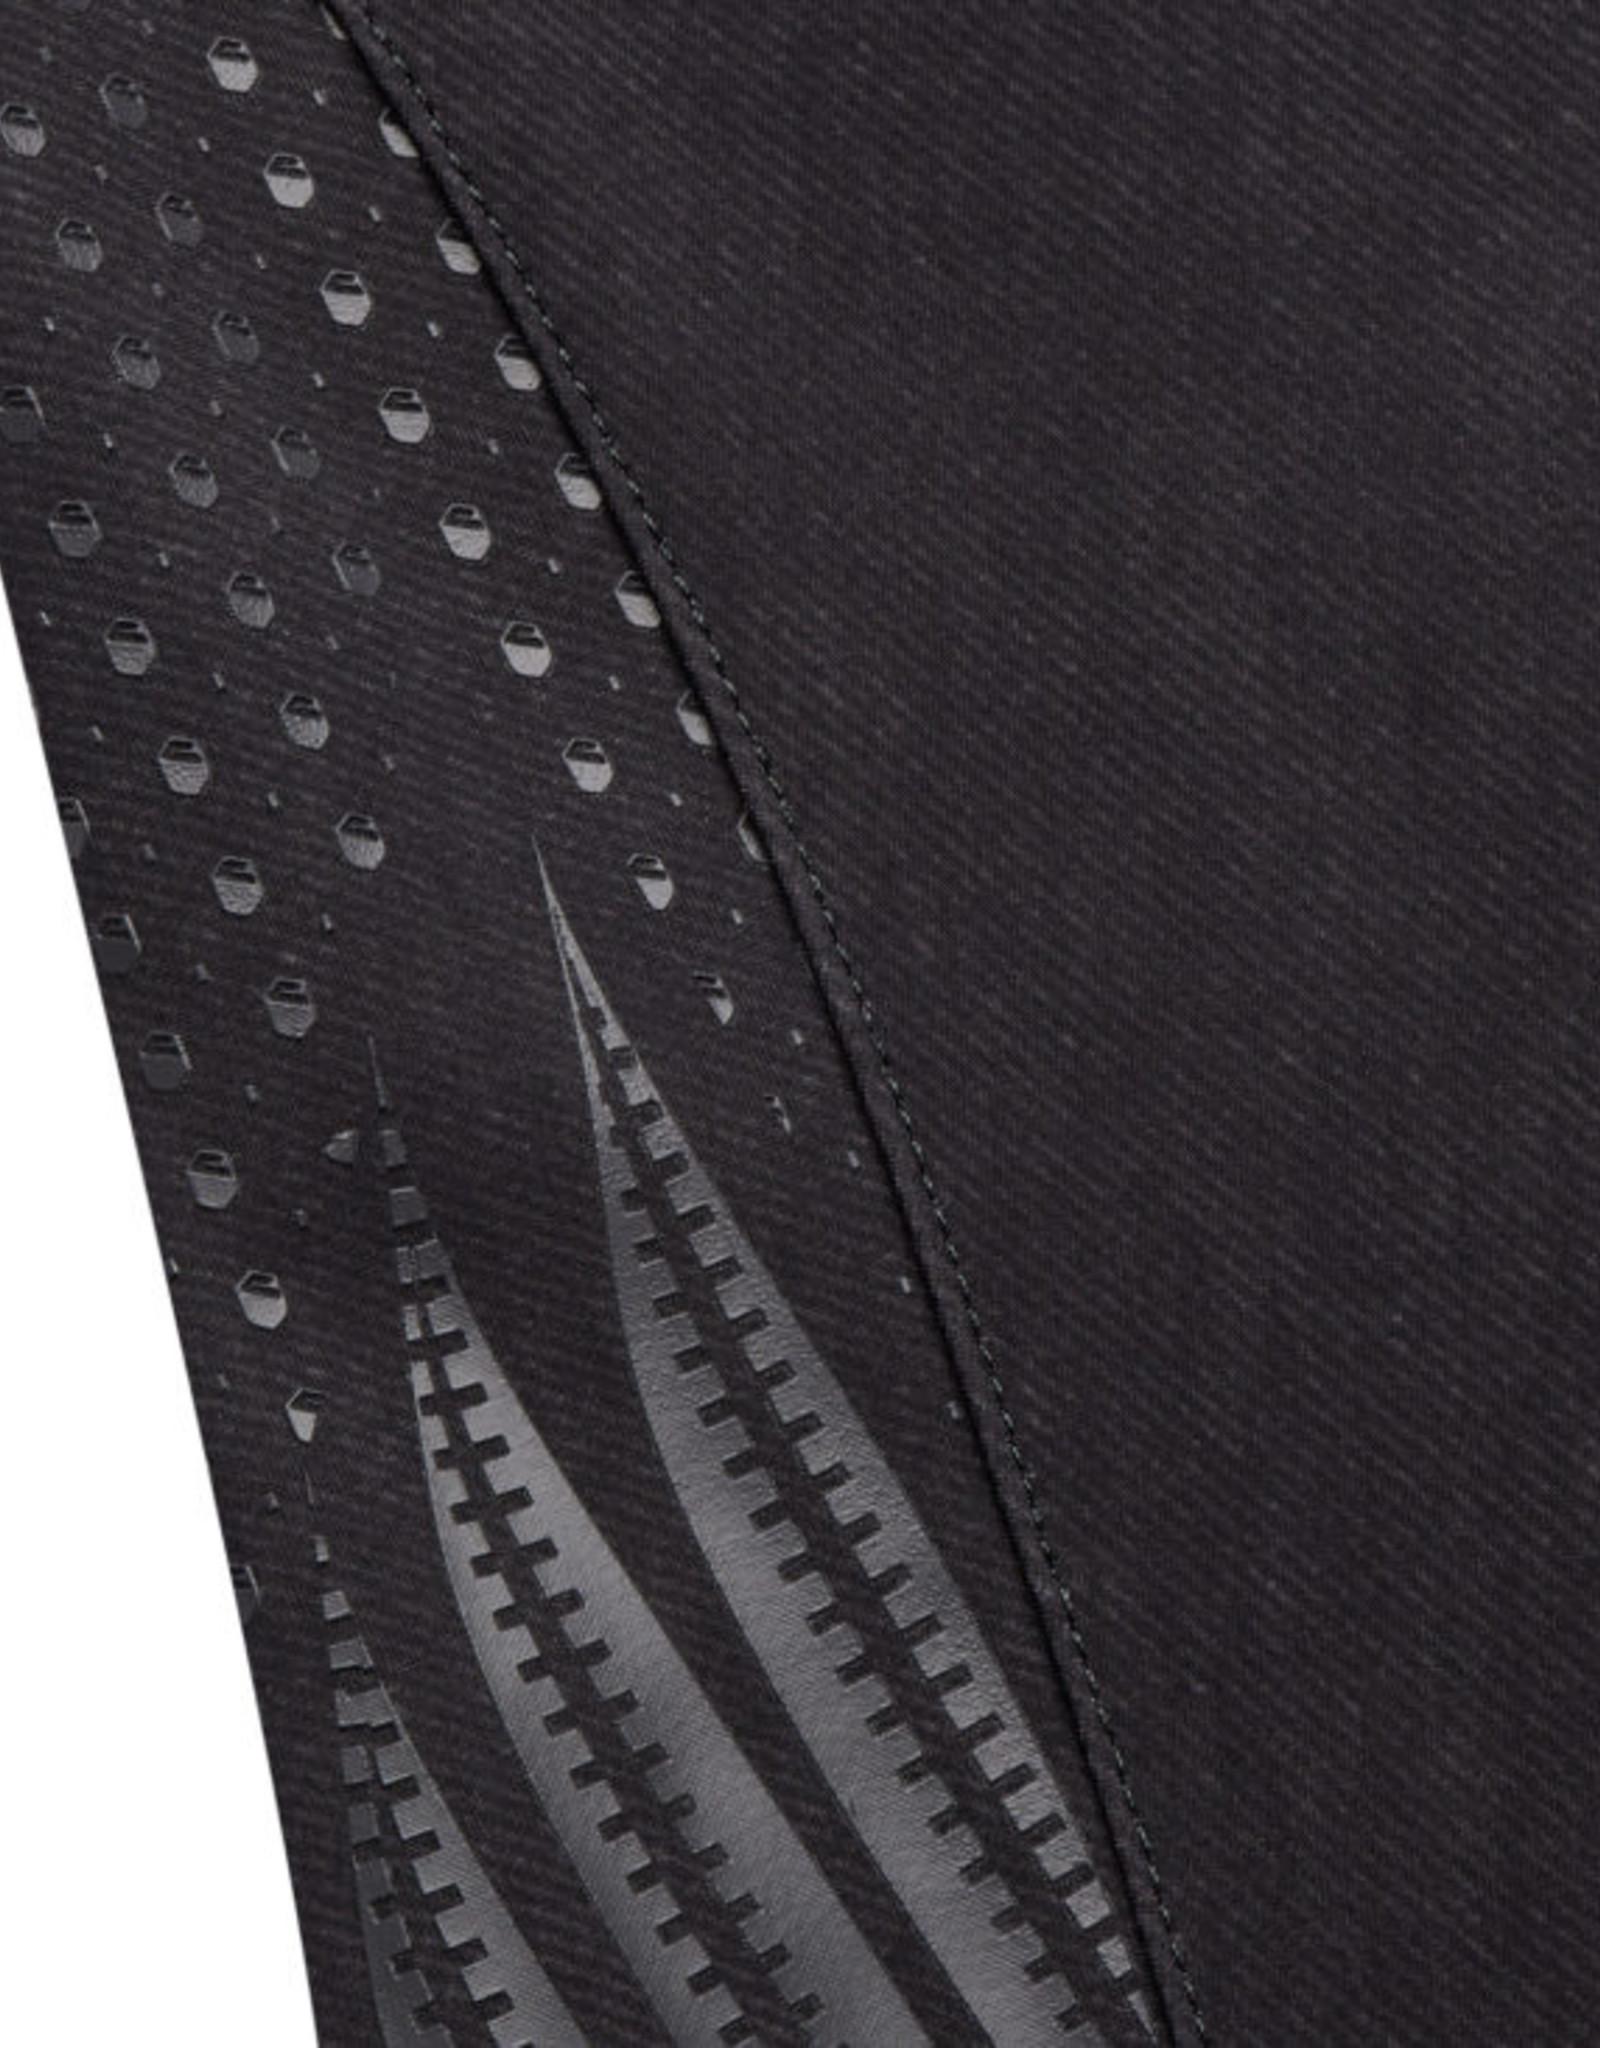 Samshield Ladies' Diane Full Seat Breeches